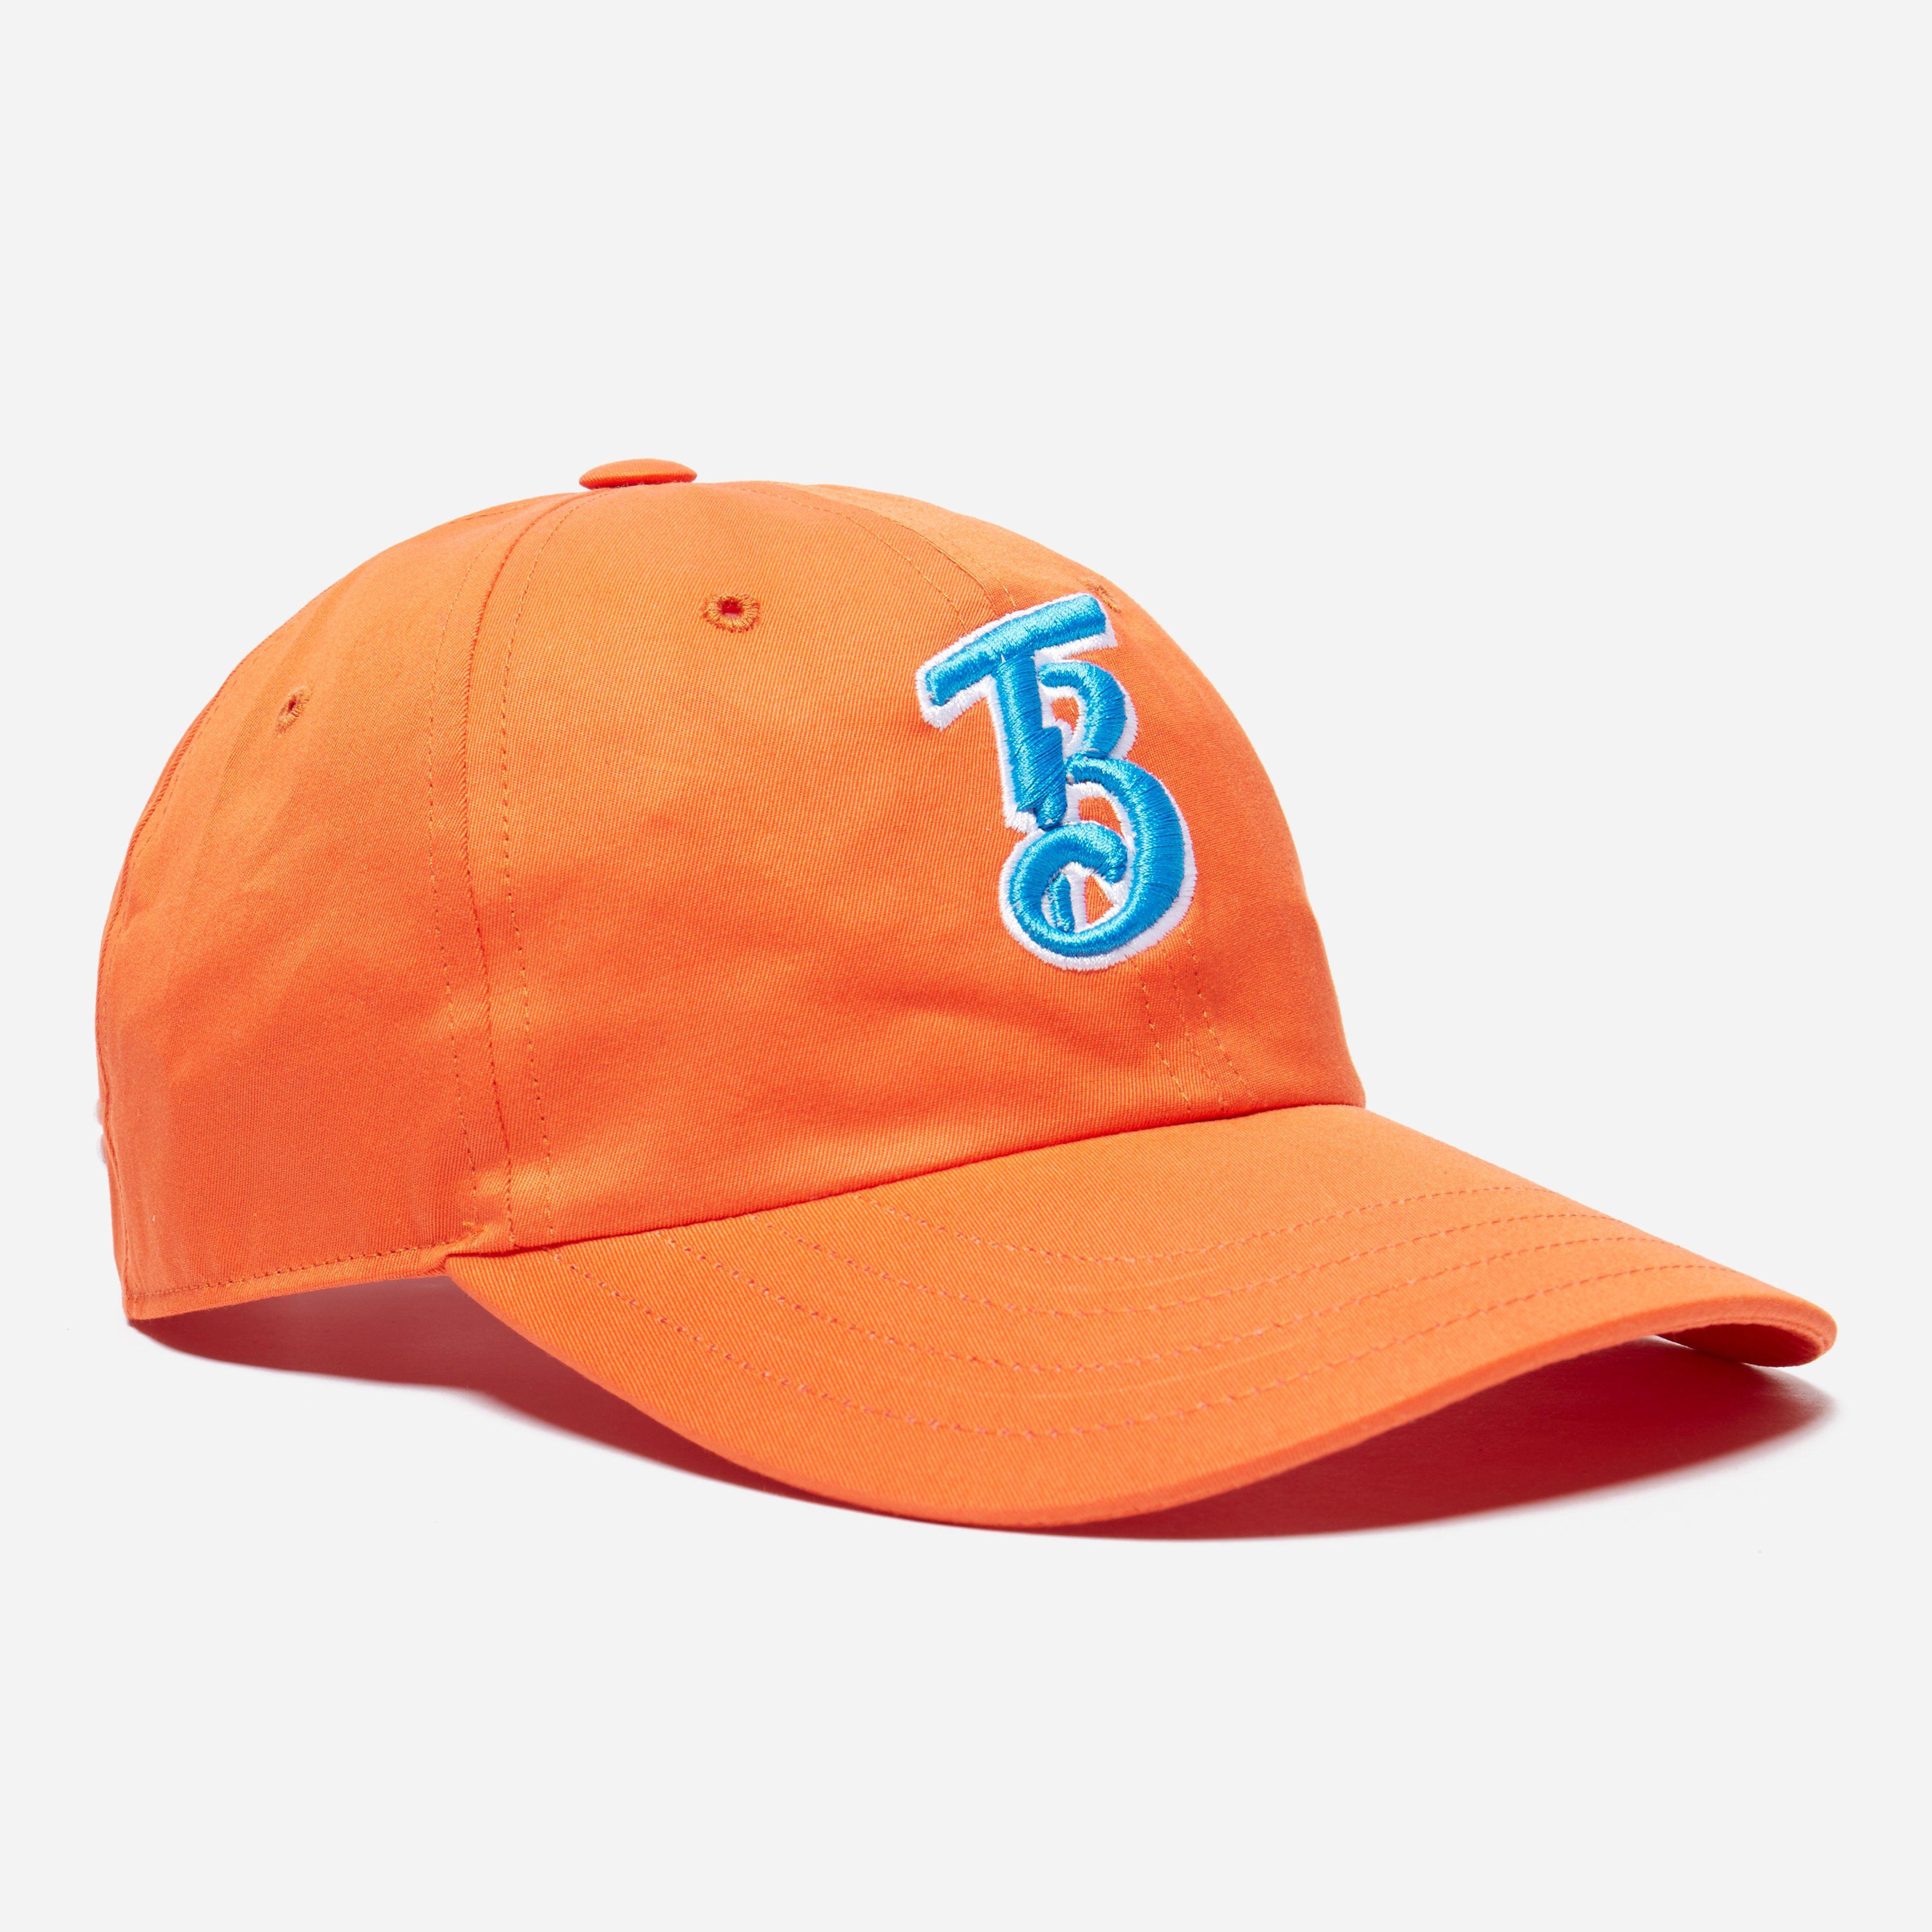 Champion x BEAMS Baseball Cap